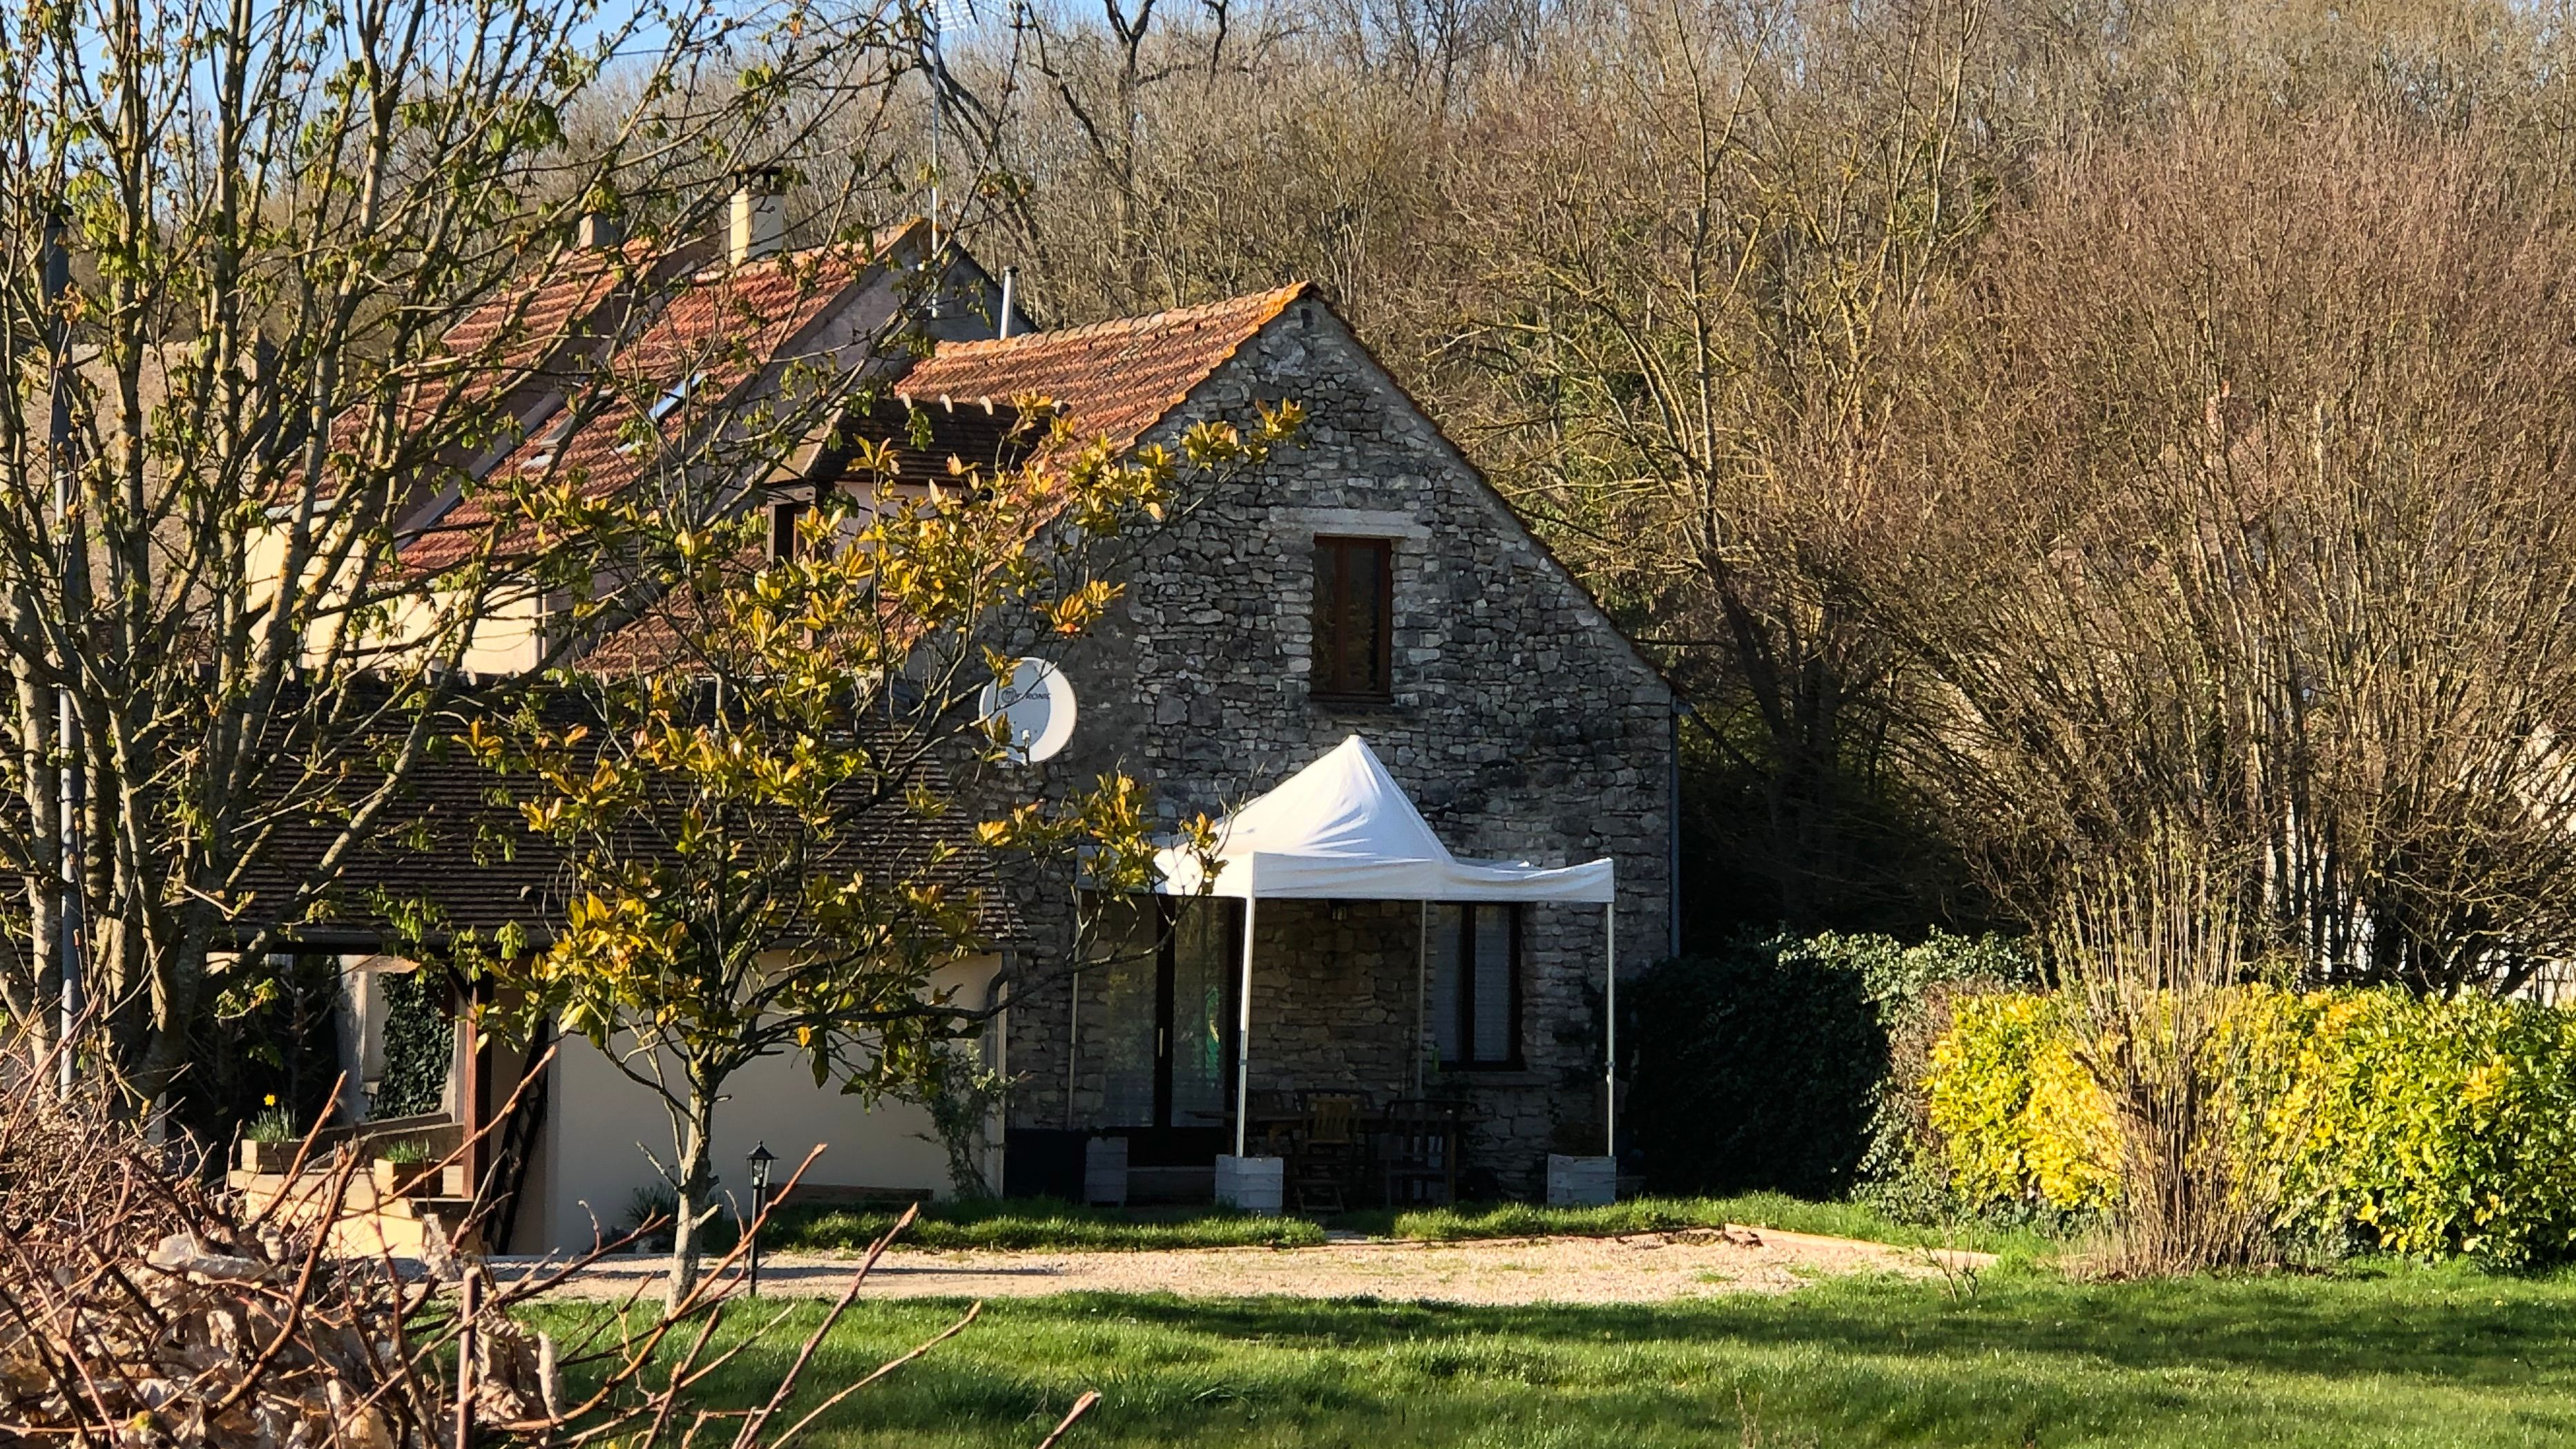 Saint-Cyr-en-Arthies (95510)